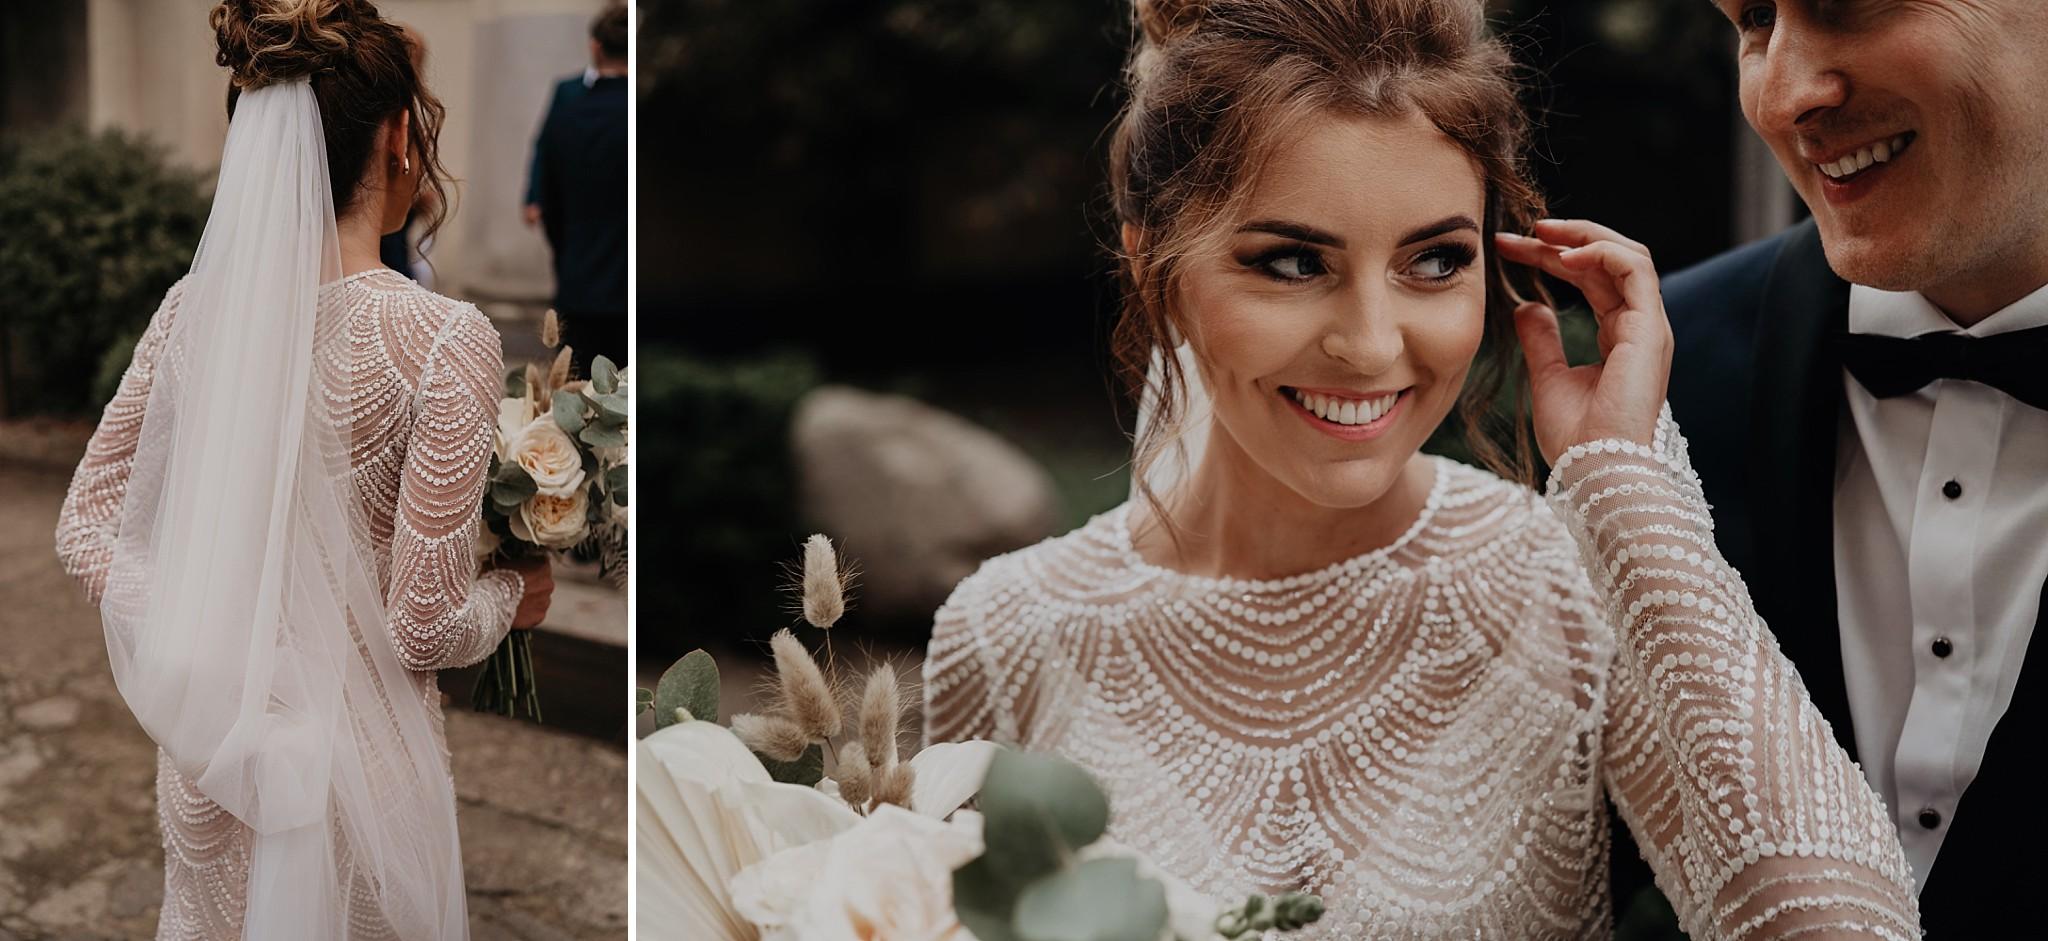 fotograf poznan wesele dobra truskawka piekne wesele pod poznaniem wesele w dobrej truskawce piekna para mloda slub marzen slub koronawirus slub listopad wesele koronawirus 133